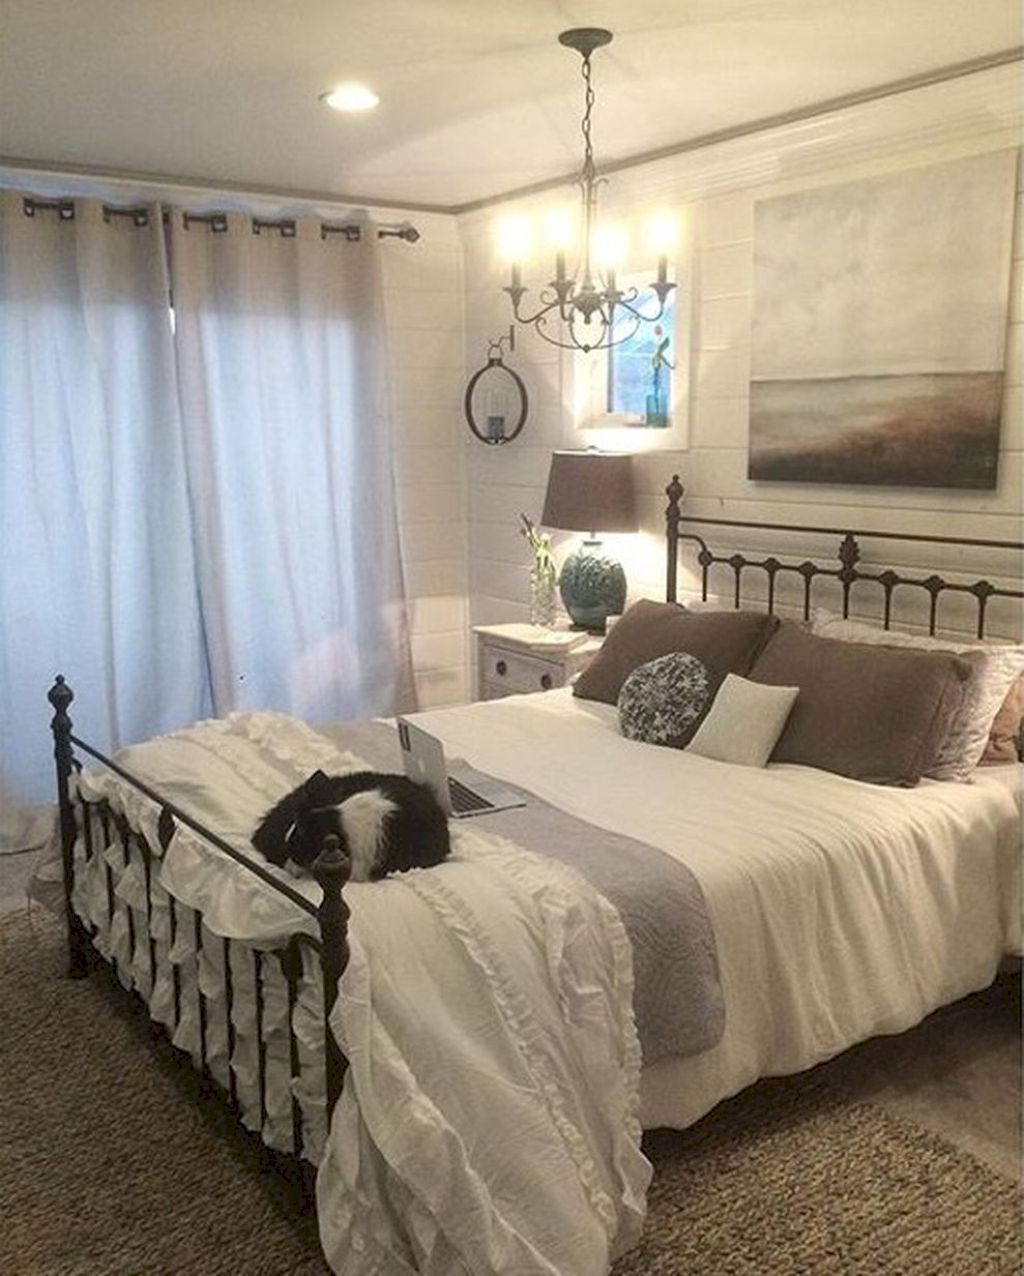 gorgeous 75 cozy modern farmhouse bedroom decor ideas on modern cozy bedroom decorating ideas id=86259